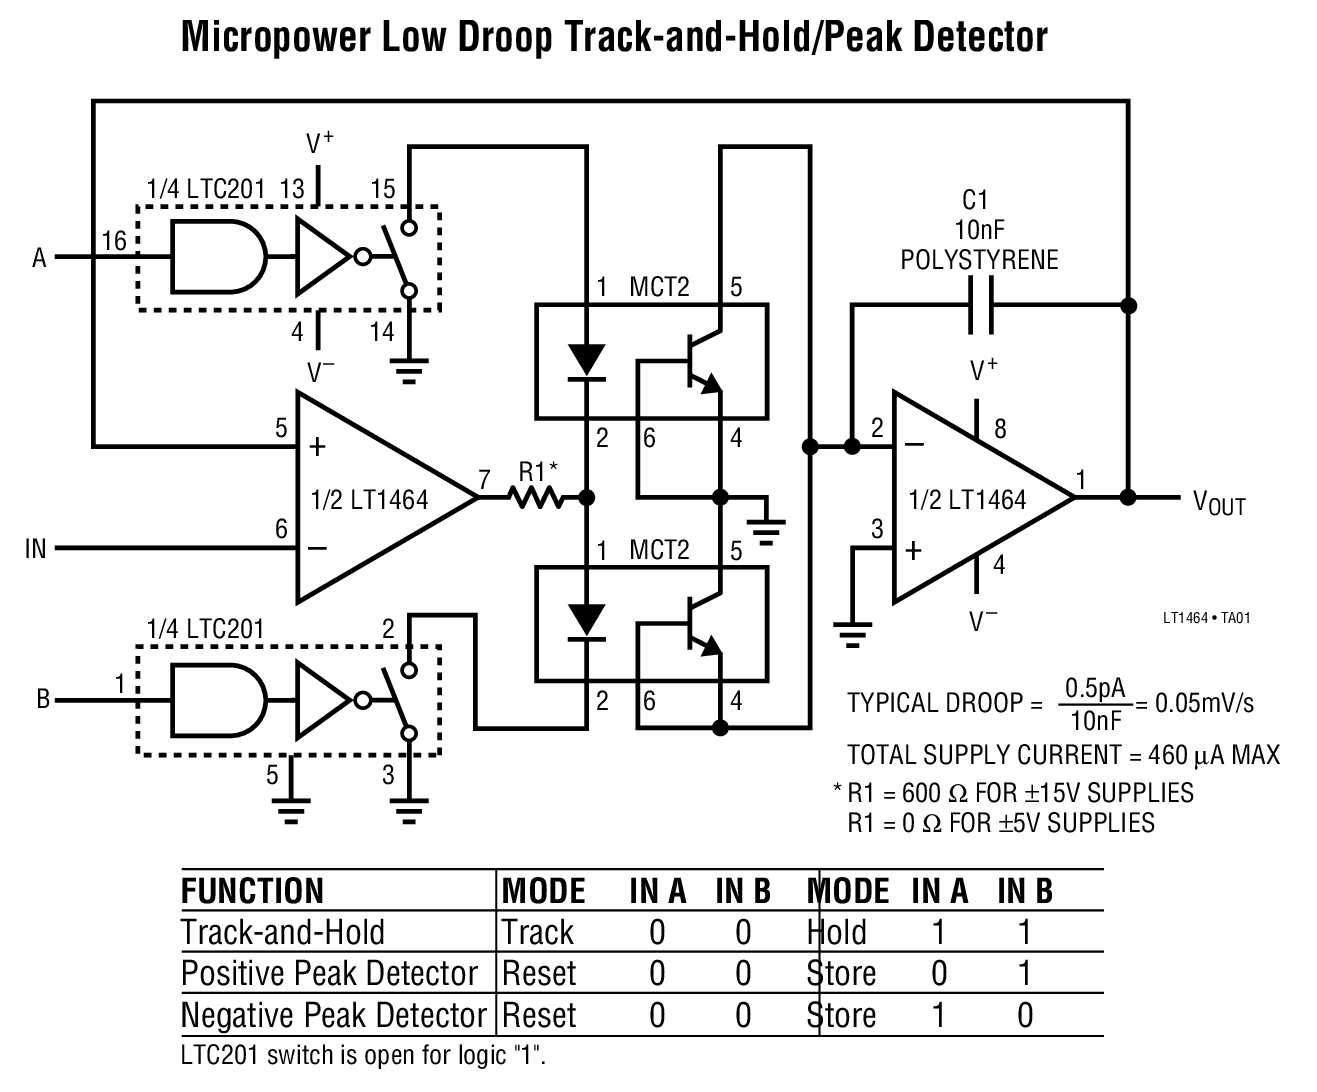 LT1464 (双通道) 和 LT1465 (四通道) 是首批可为高达 10nF 的电容性负载提供微微安输入偏置电流 (典型值为 500fA) 和单位增益稳定性的微功率运放 (每个放大器的最大电源电流为 200A)。输出能够将一个 10k 负载摆动至任一电源的 1.5V 之内,就像那些所需电源电流高出一个数量级的运放一样。这种独特的性能组合使 LT1464 / LT1465 非常适合于很宽的输入和输出阻抗范围。 在 LT1464 / LT1465 的设计和测试中,重点特别放在了优化低成本 SO-8 (双